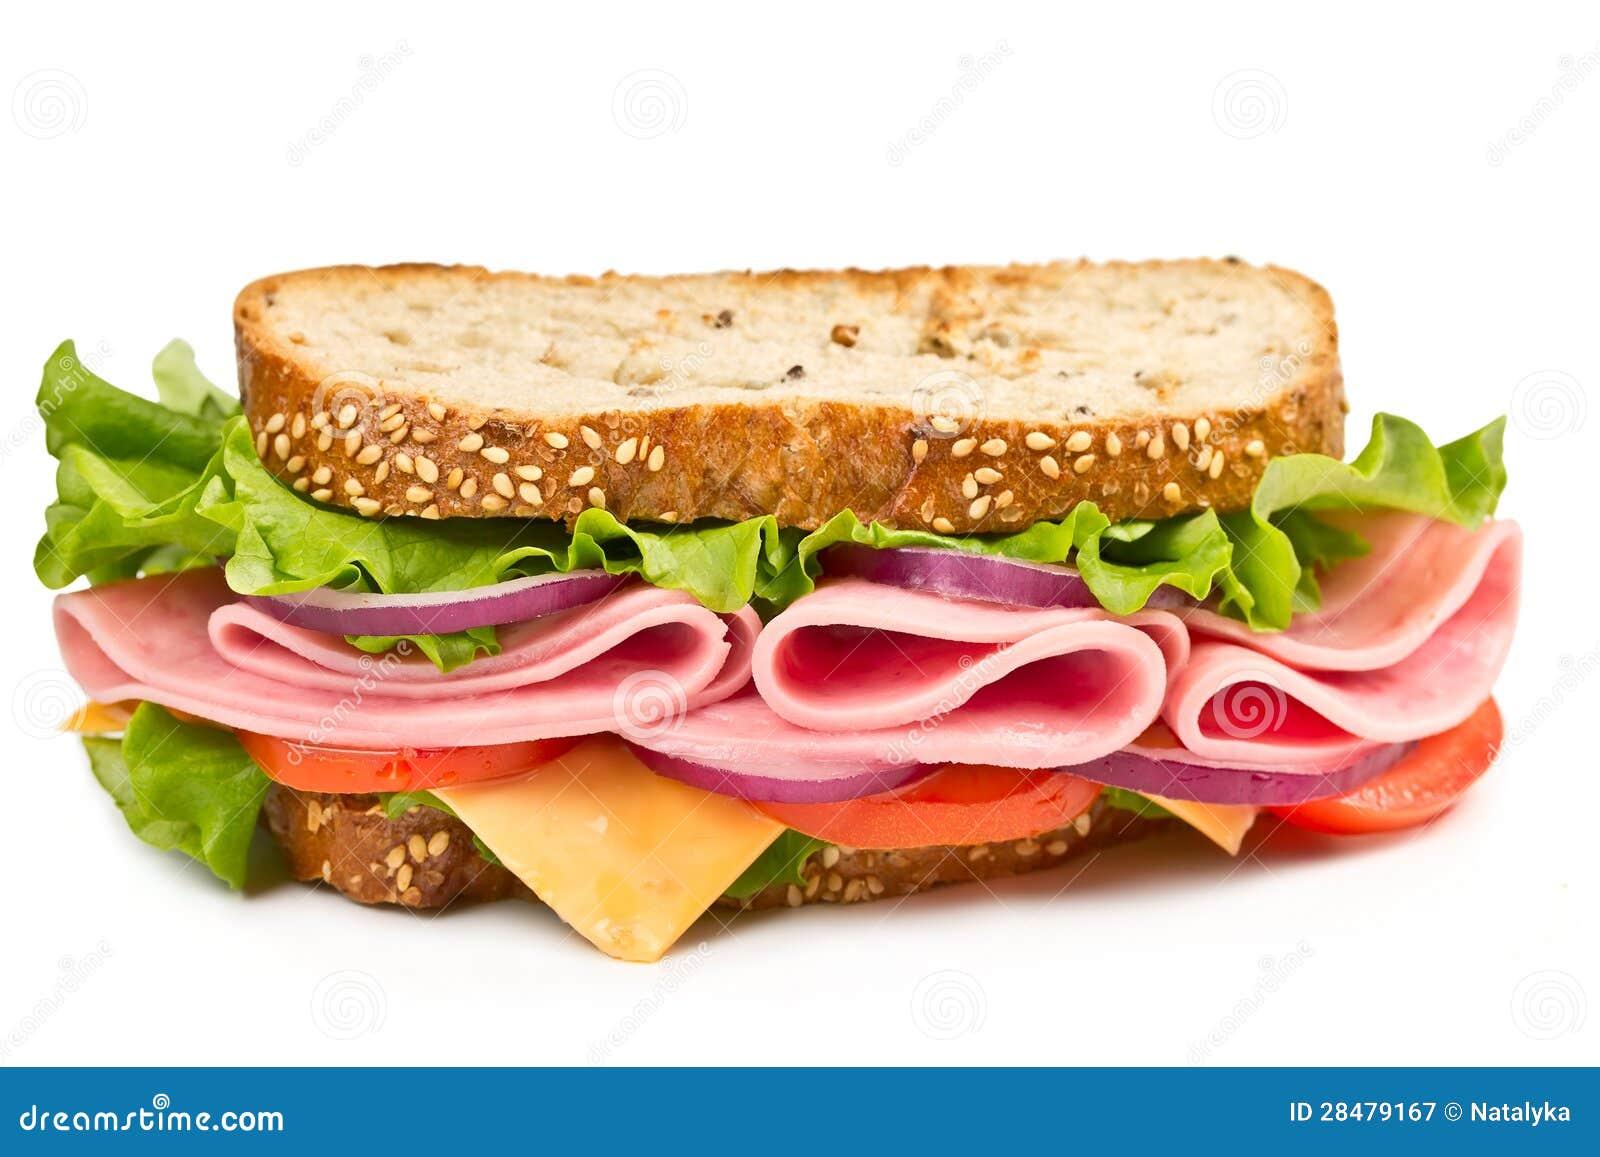 Sanduíche com presunto, queijo e tomate